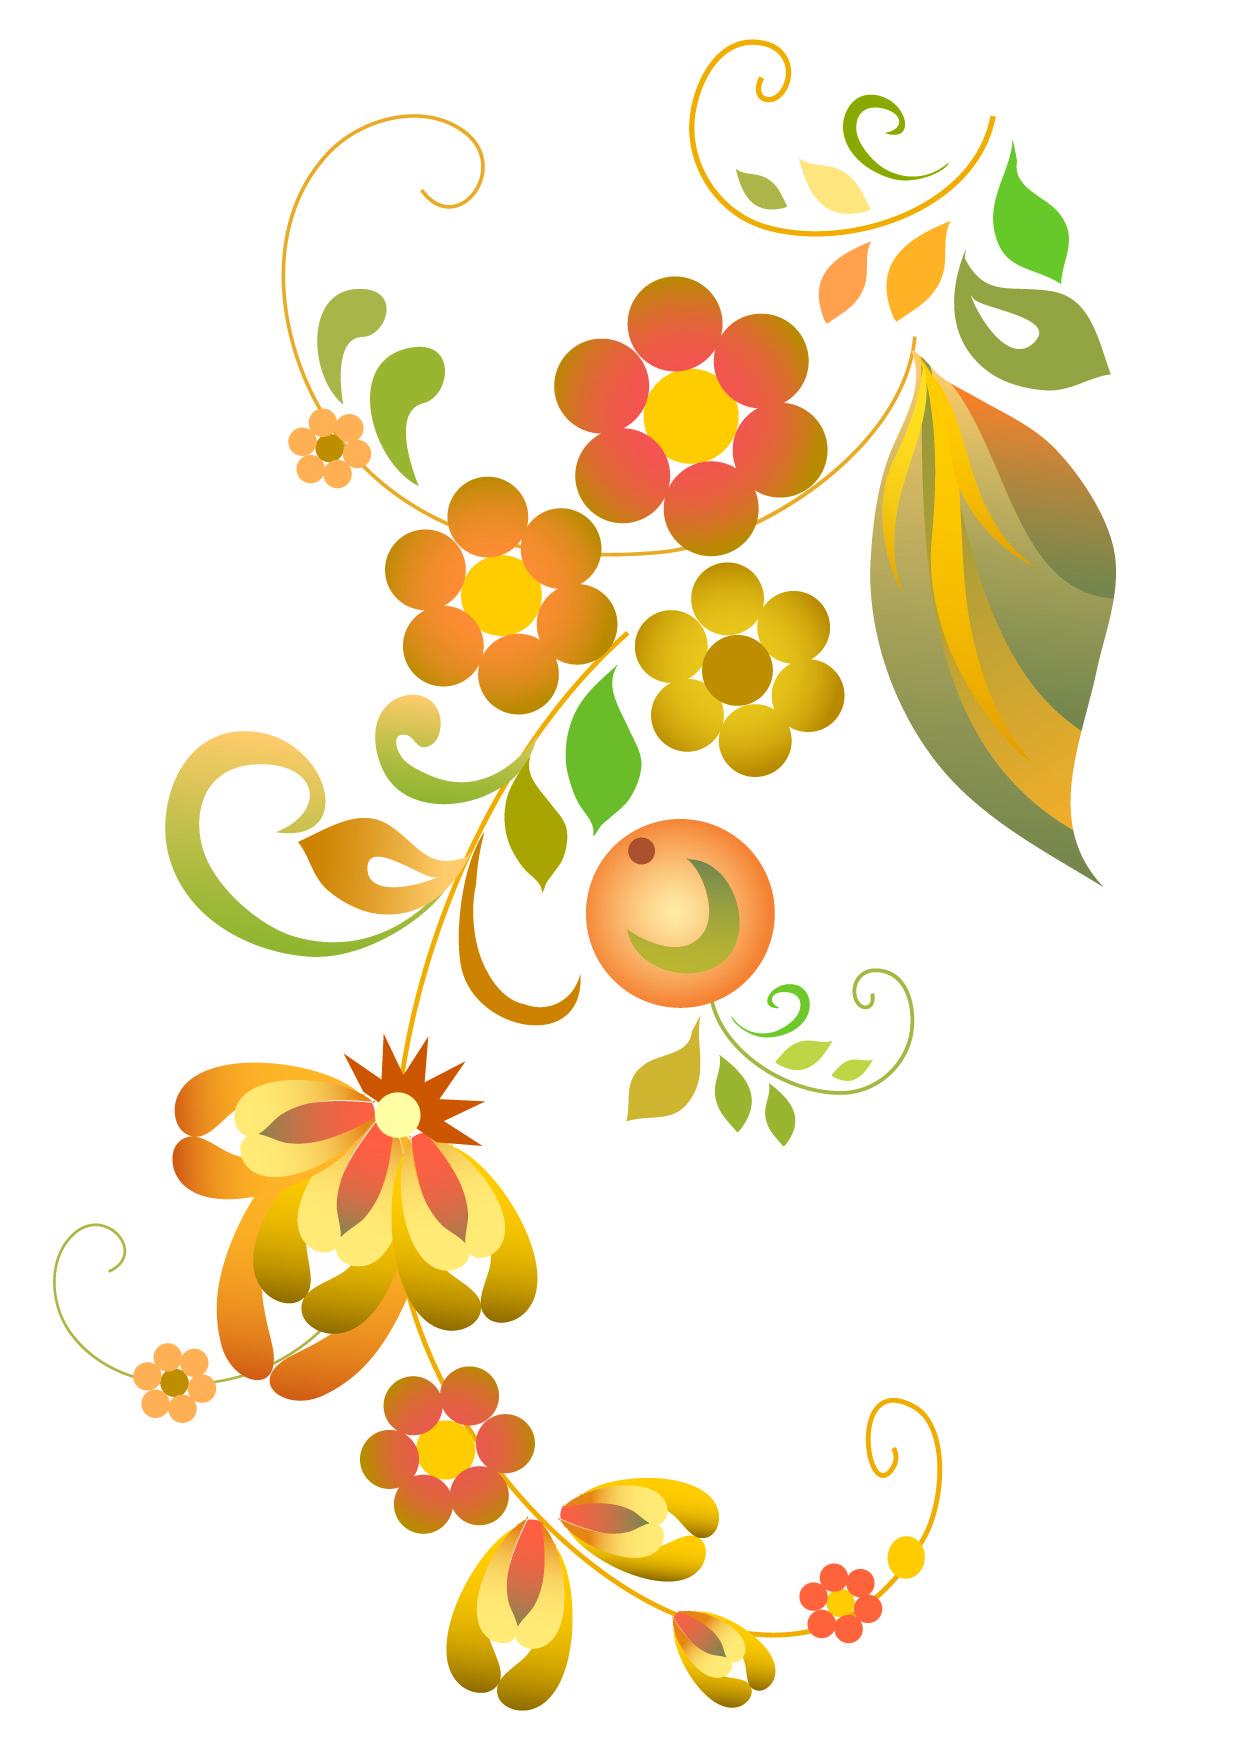 Free Flower Vector Art - ClipArt Best